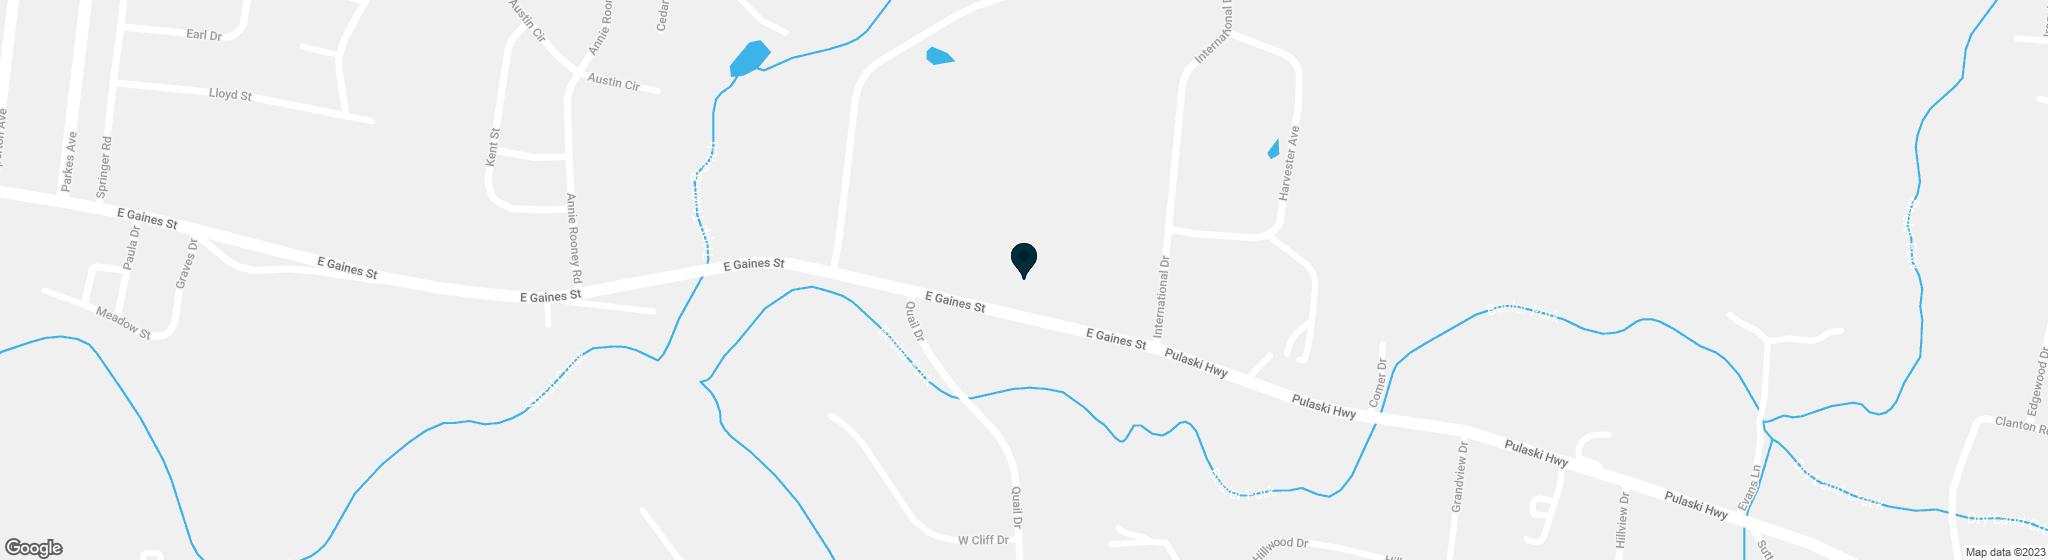 2180 E Gaines St Lawrenceburg TN 38464